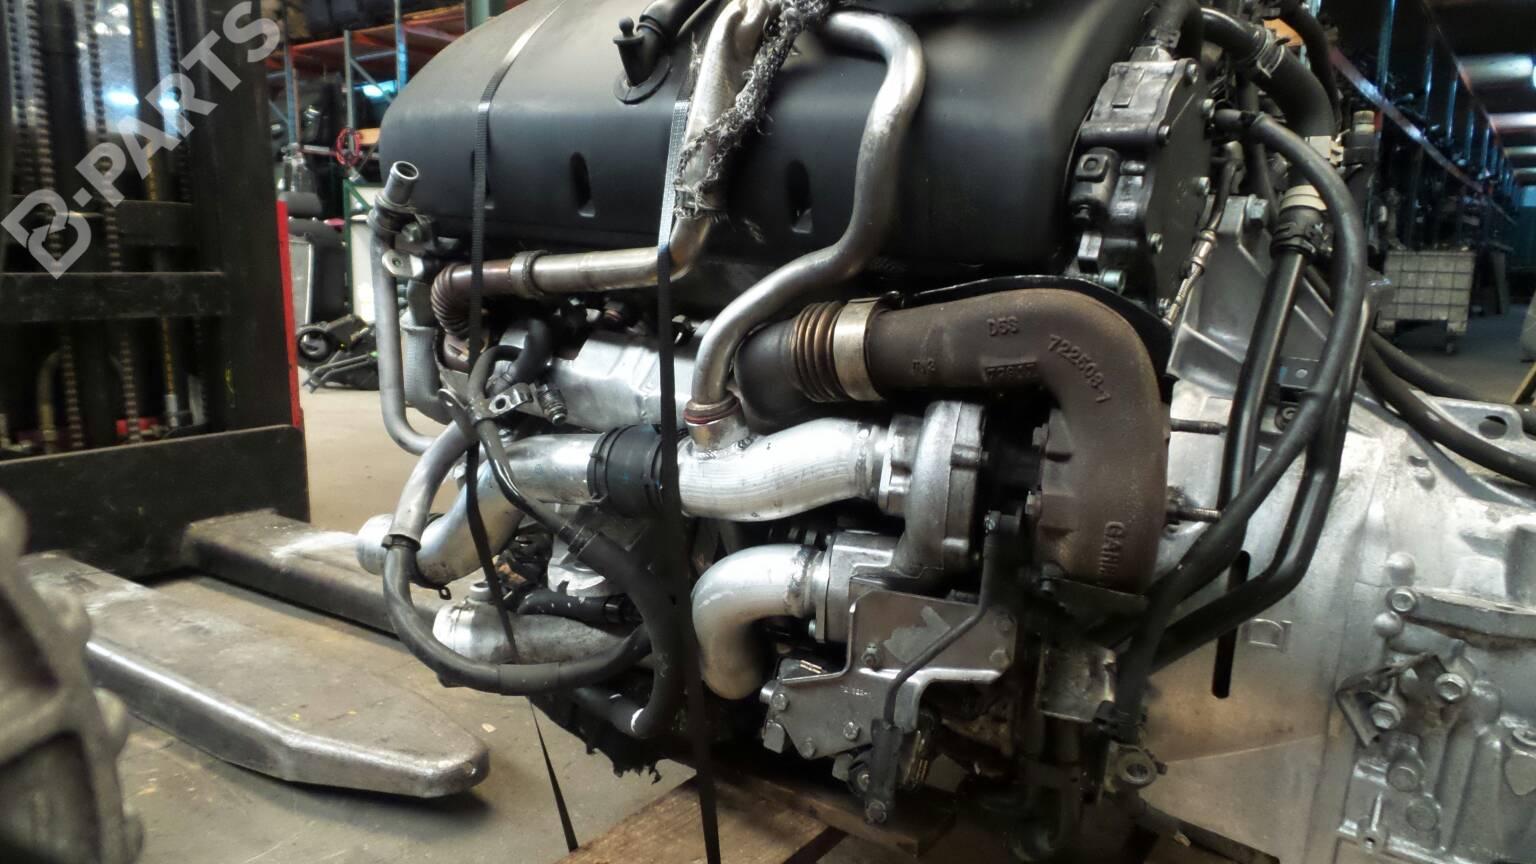 Engine Vw Touareg 7la 7l6 7l7 50 V10 Tdi 19015 Fuse Box Location Complete Ayh 010501